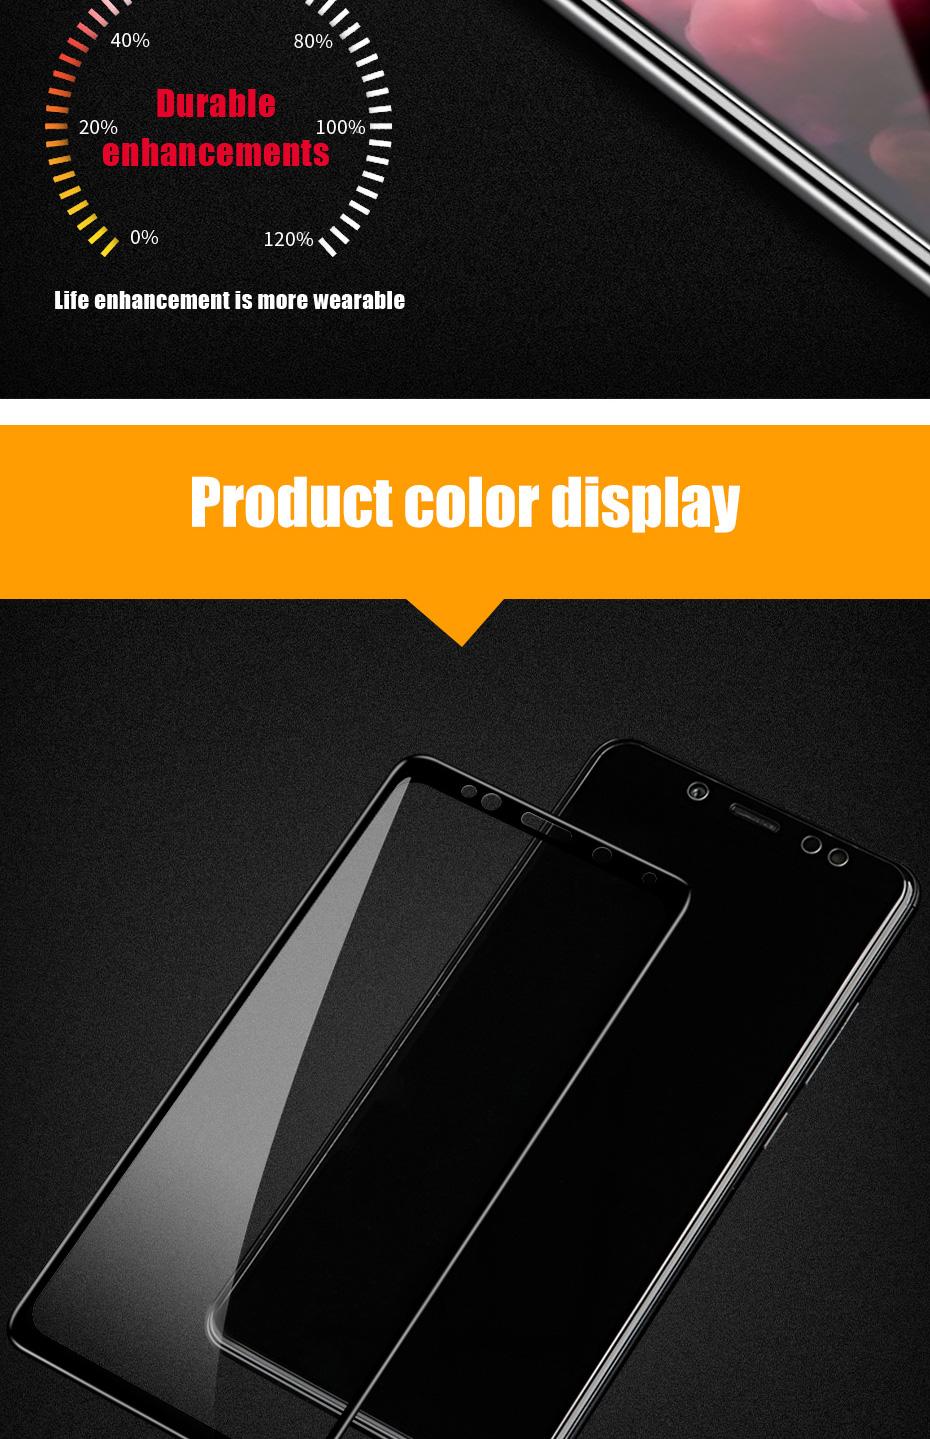 ZNP 5D Screen Protector Tempered Glass For Xiaomi Redmi Note 7 5 Pro Redmi 4X 7A 7 6 Protective Glass For Redmi 5 Plus k20 Film 9